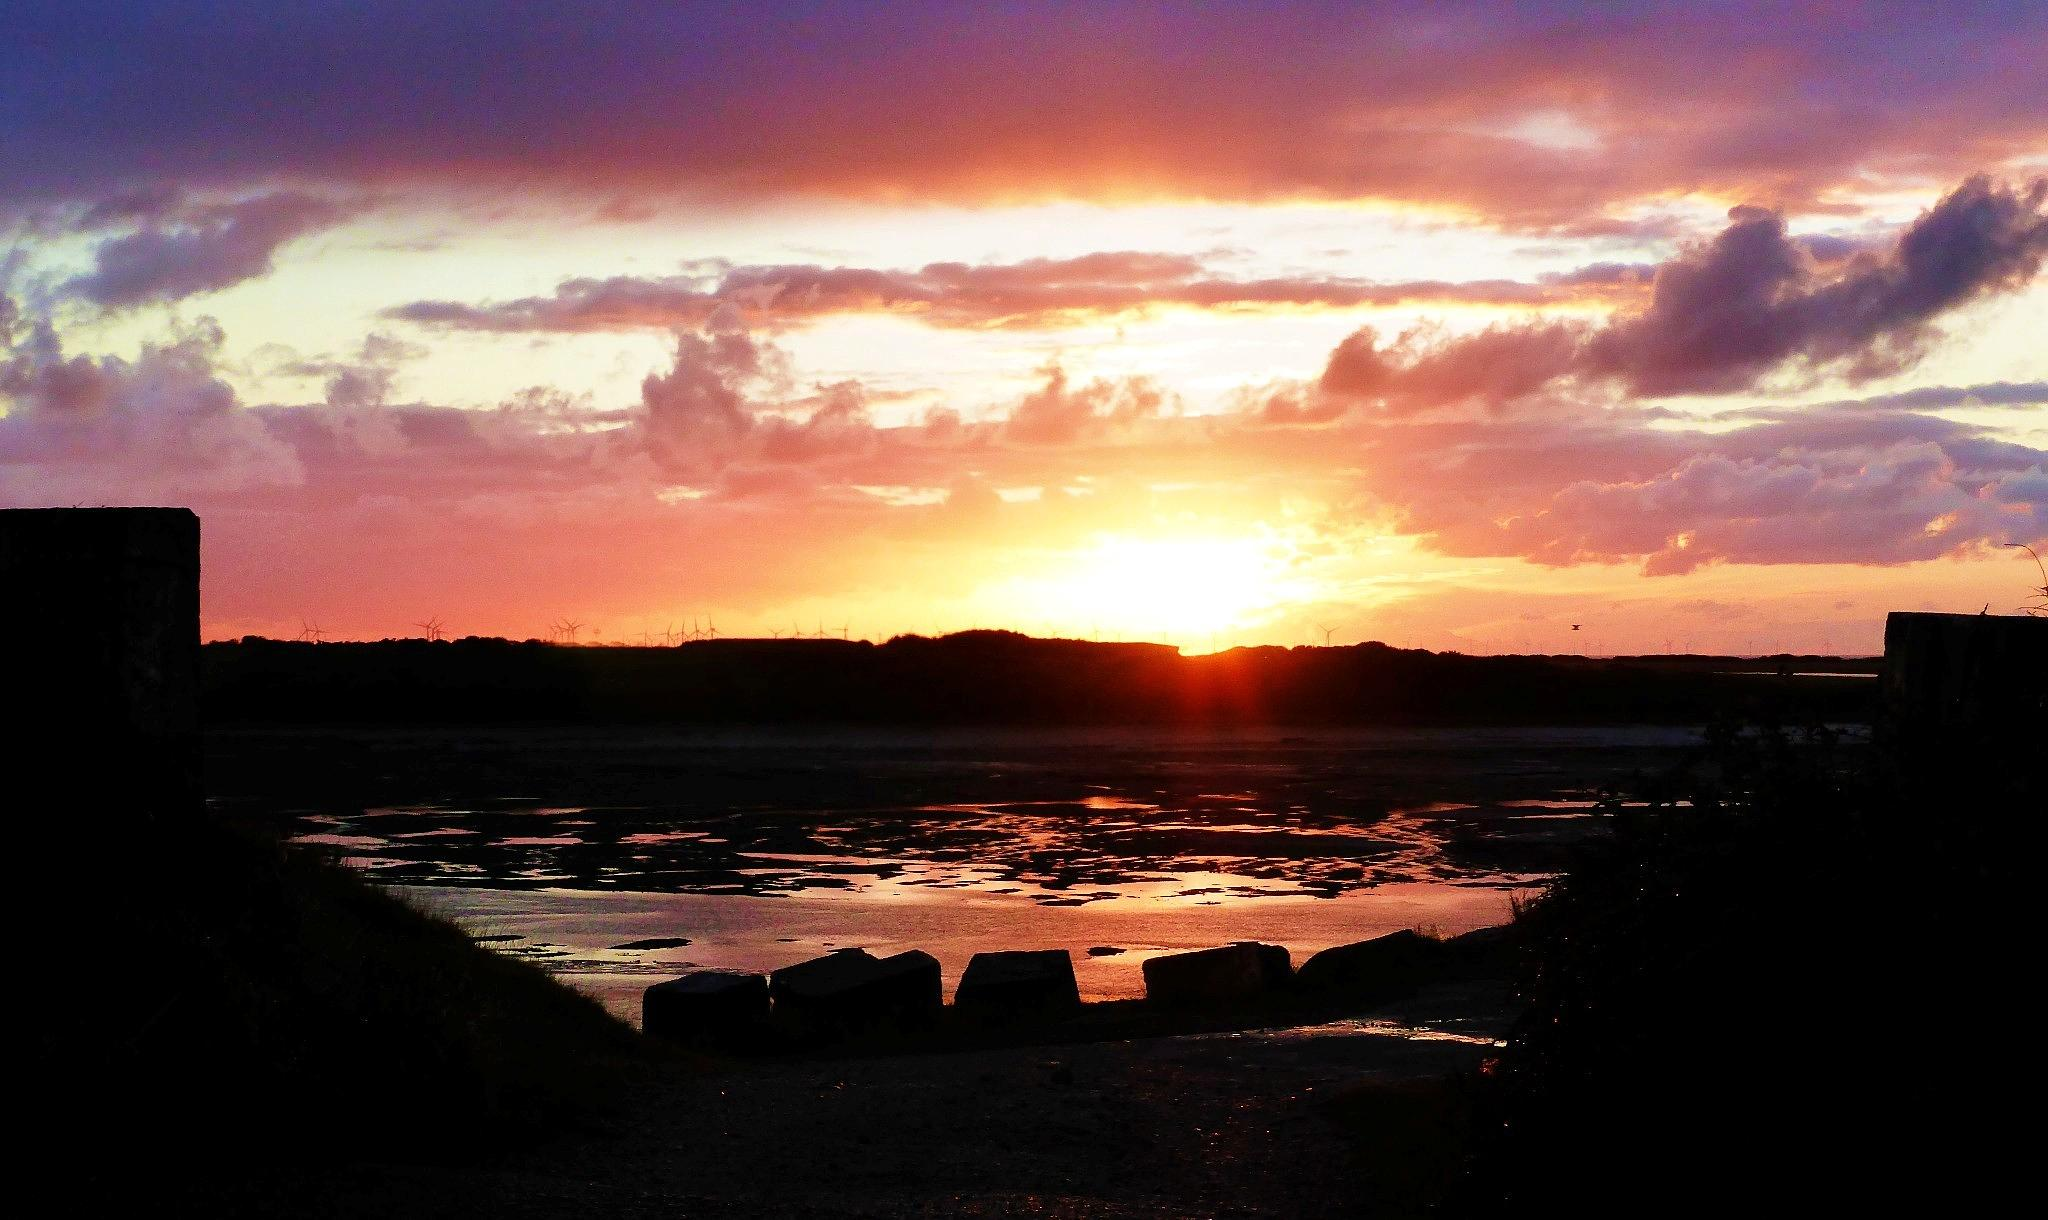 SUNSET by cheryl.ferrarkirkham